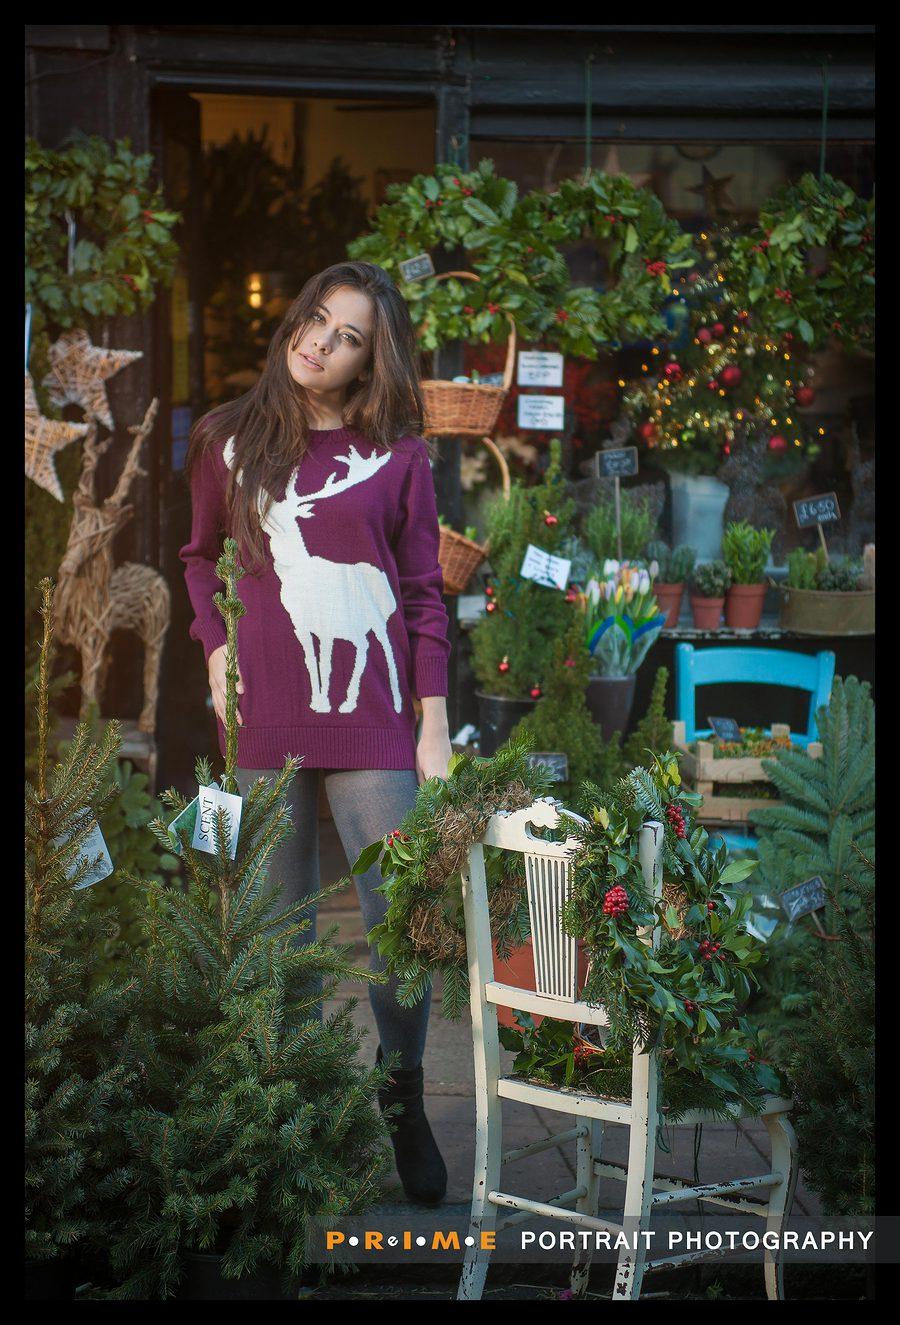 Nina Jade and Vacant Clothing / Photography by preime photography, Model Nina Jade / Uploaded 10th December 2013 @ 07:22 PM